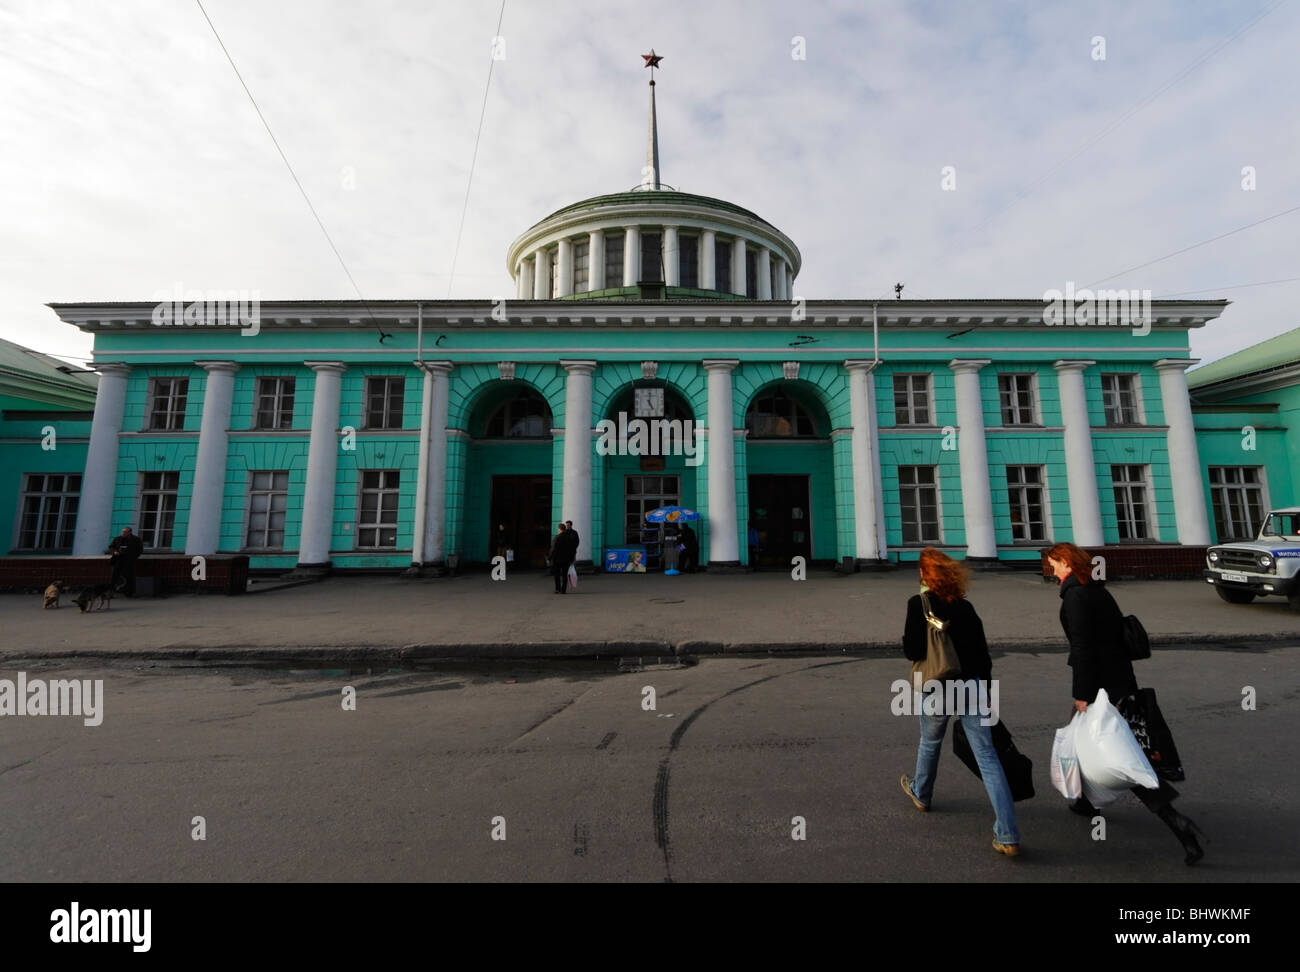 The railway station, Murmansk, Arctic Russia. - Stock Image